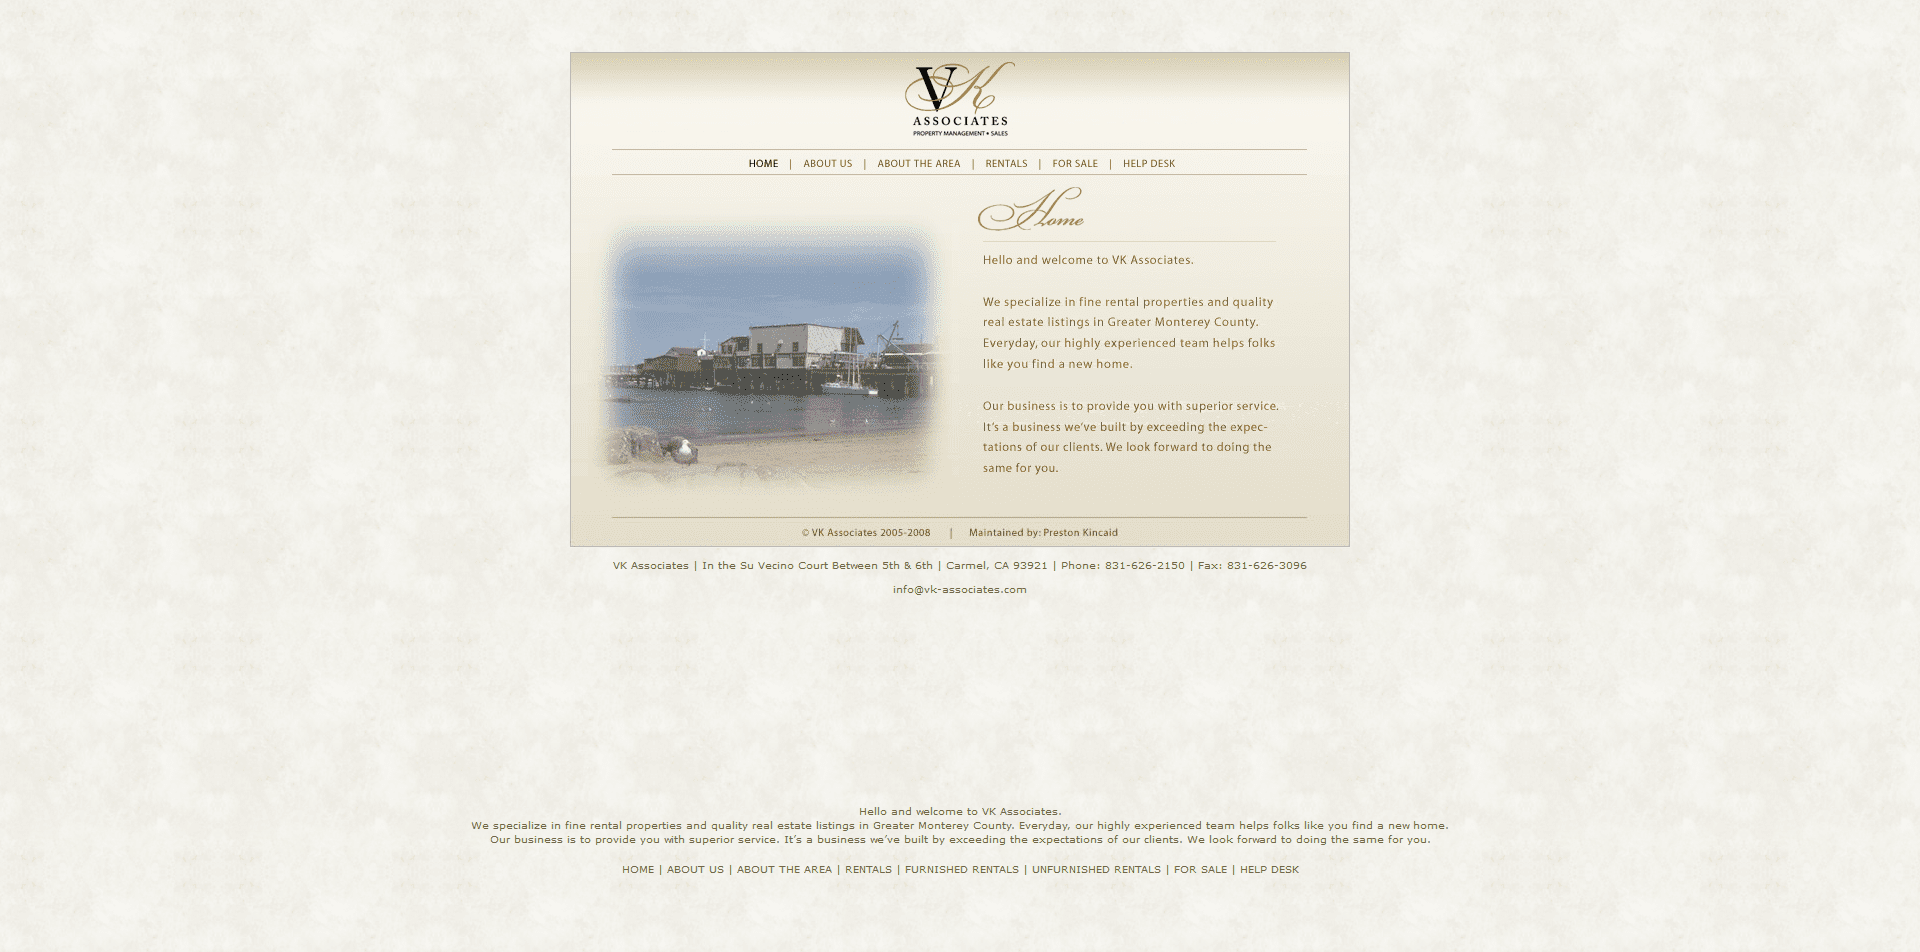 VK Associates_before